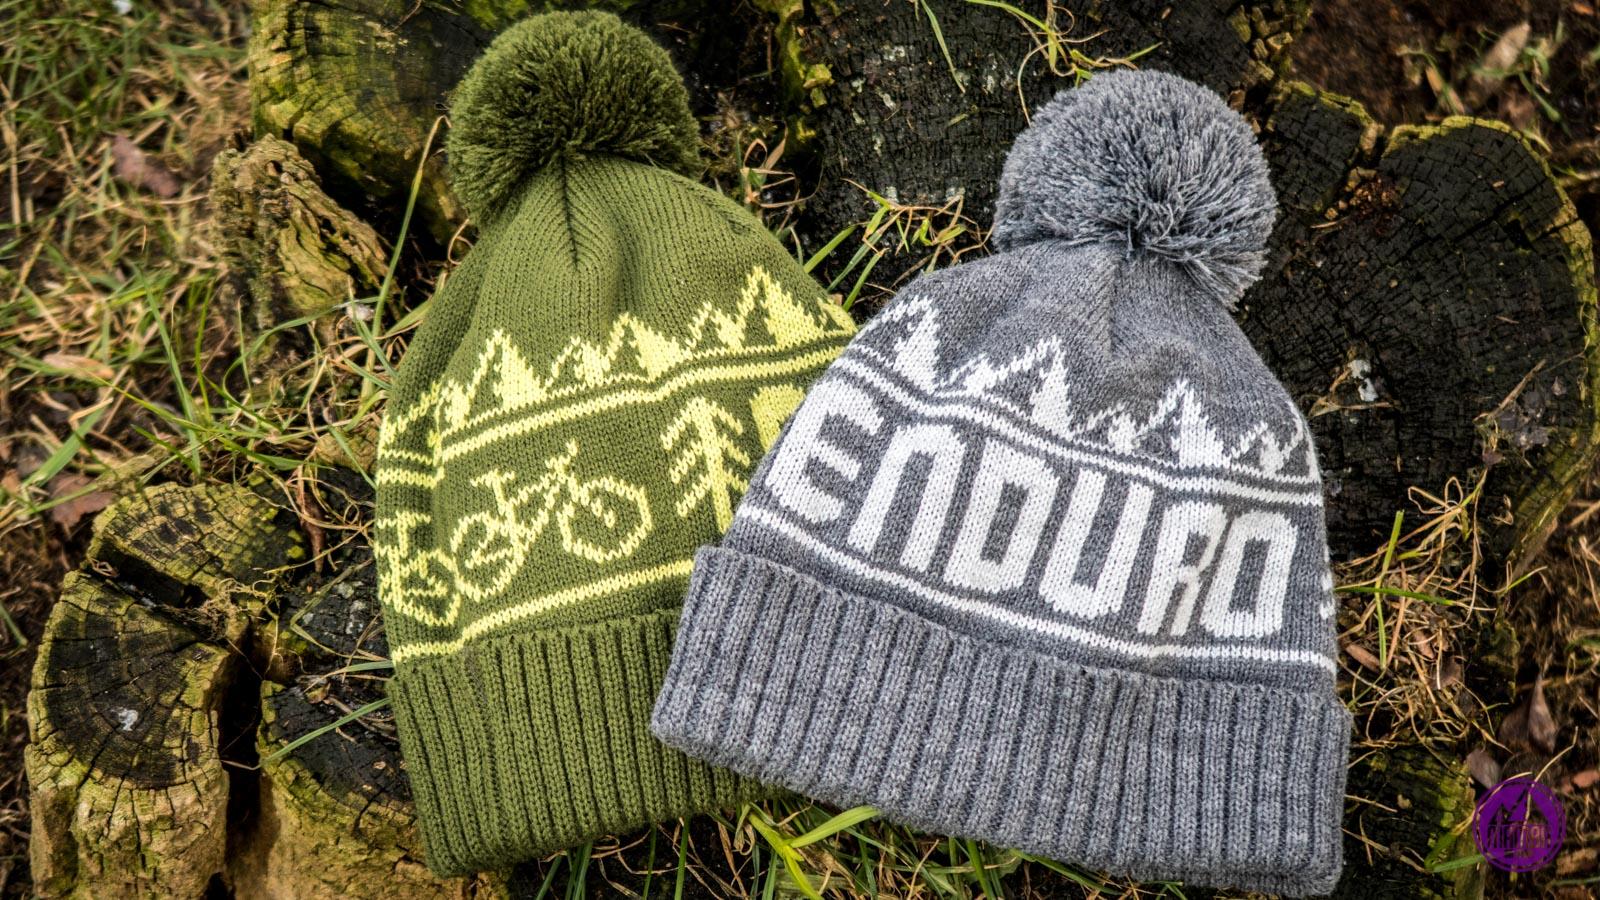 czapka-z-pomponem-enduro-2831-2.jpg